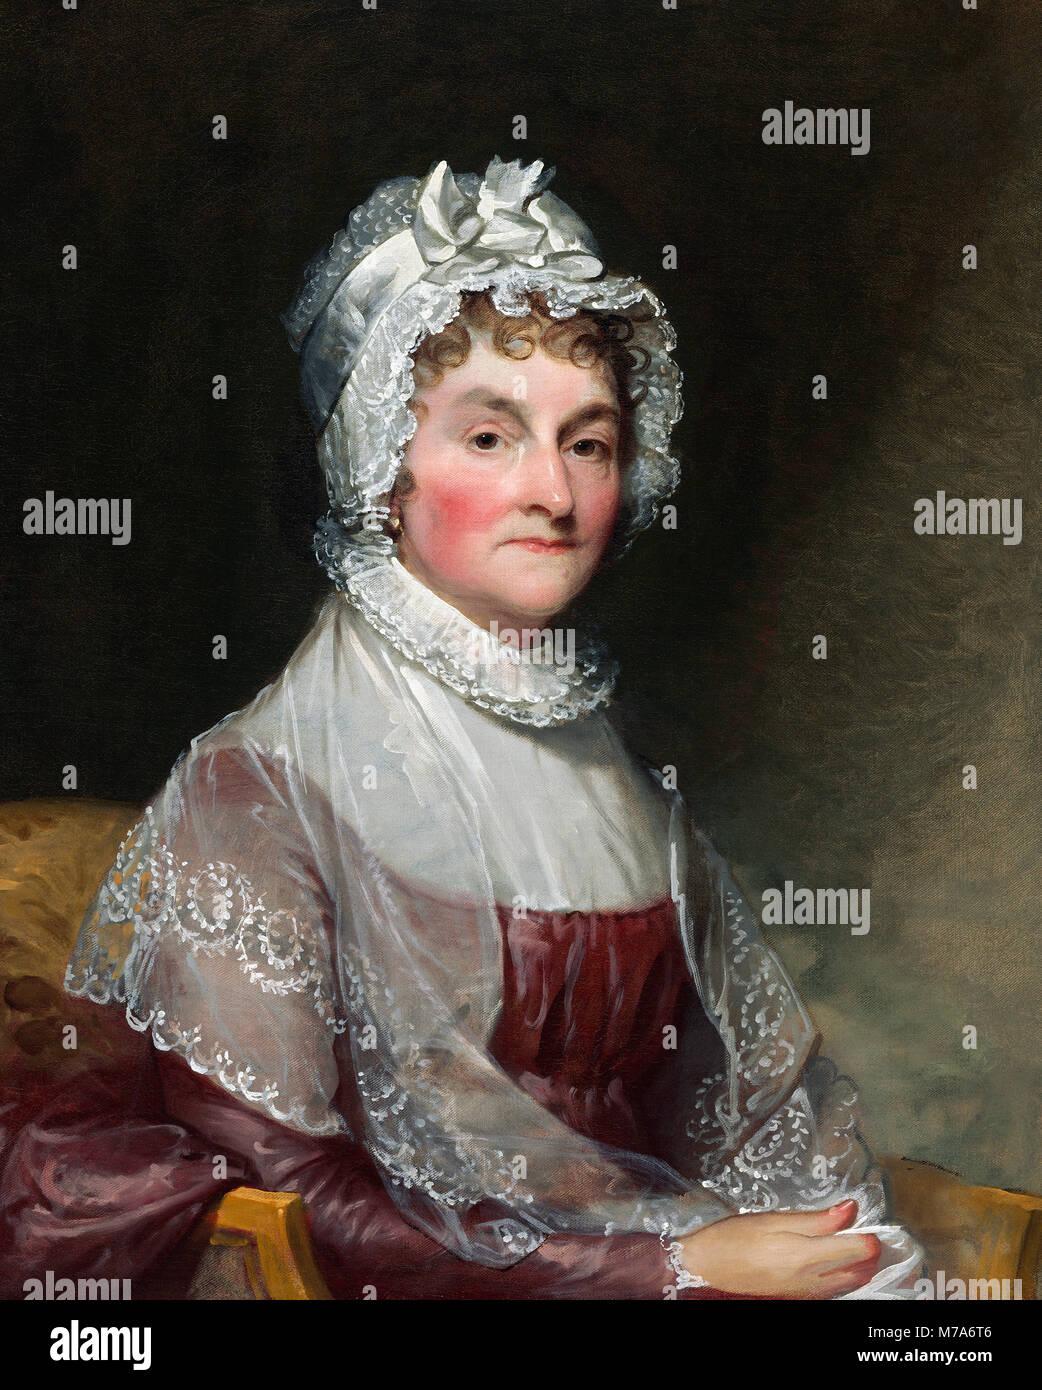 Abigail Adams (nee Smith: 1744-1818), wife of 2nd US President John Adams. Portrait by Gilbert Stuart, oil on canvas, - Stock Image